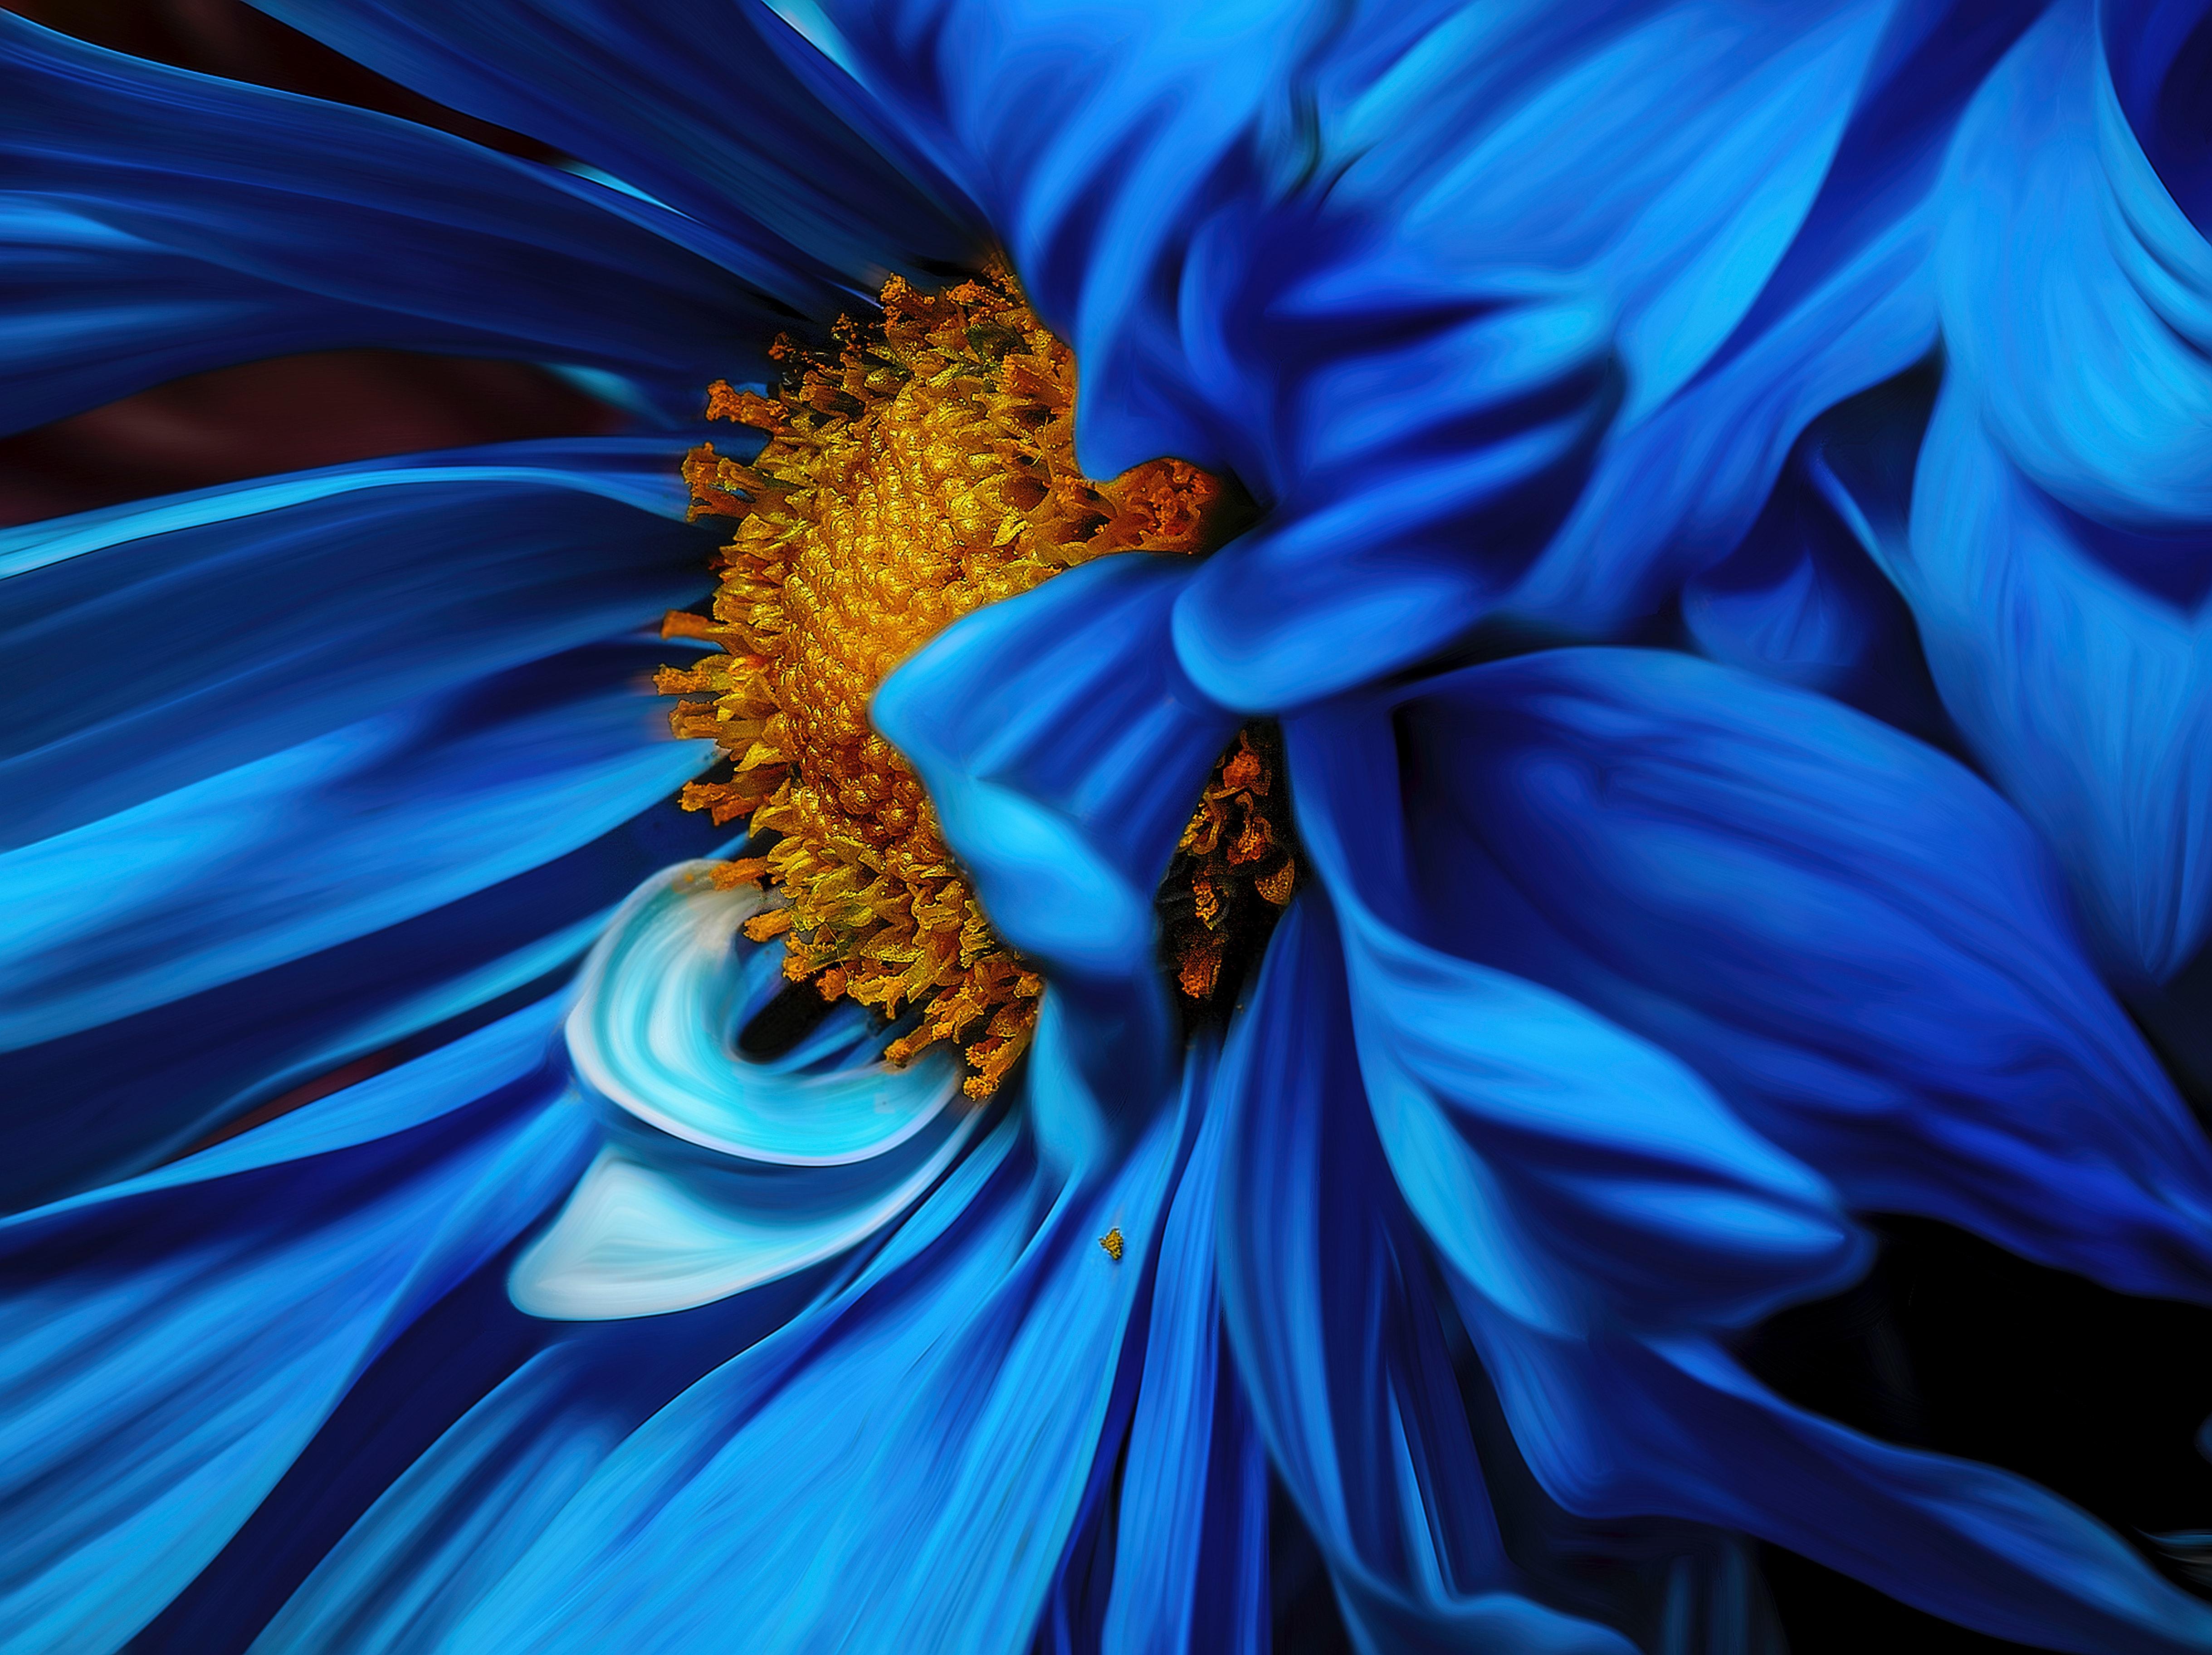 1000 Great Blue Flowers Photos Pexels Free Stock Photos